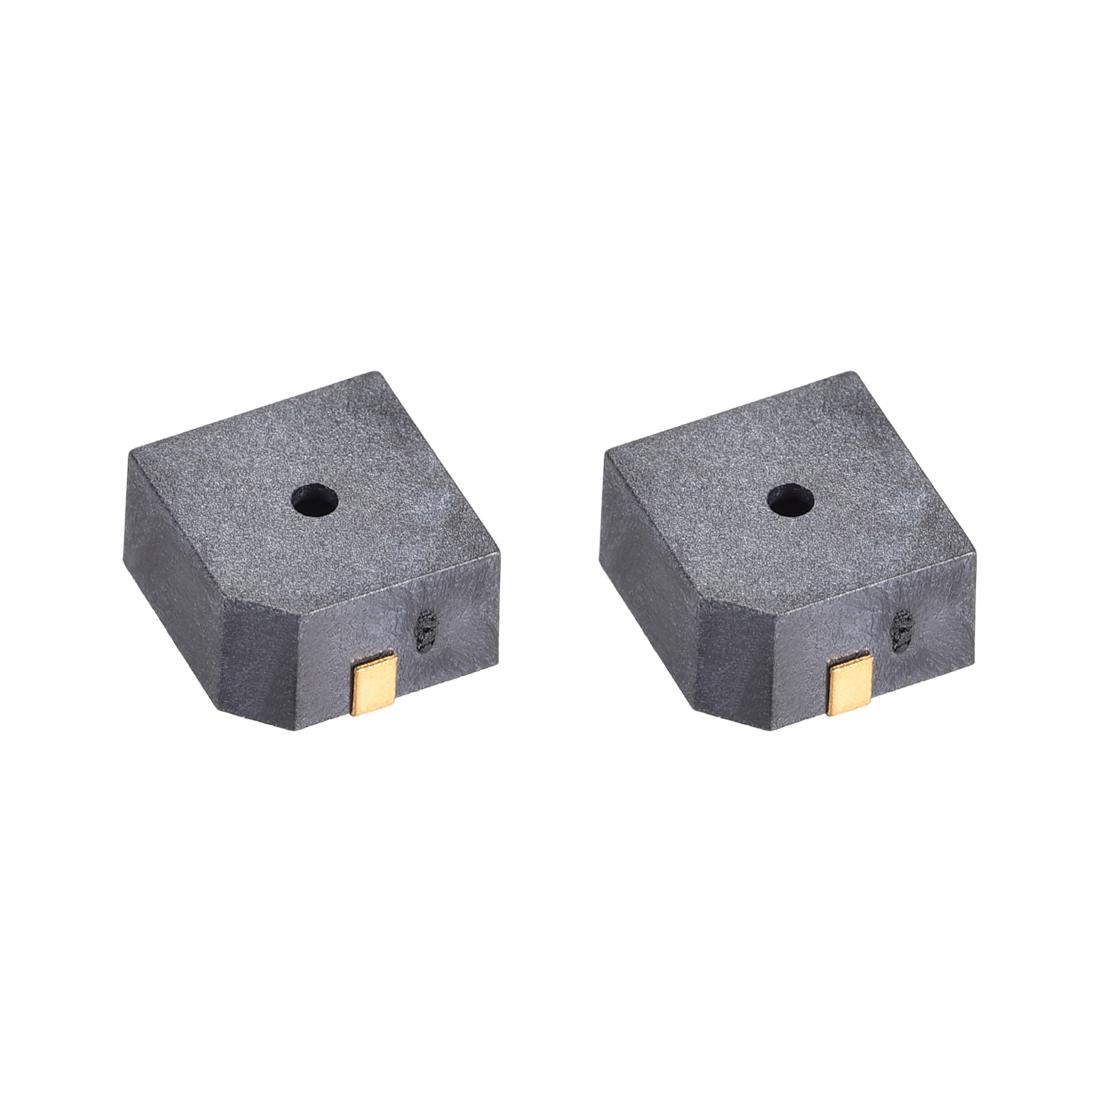 85dB 3.3V Passive Electronic Buzzer Electromagnetic Beep Piezo Alarm Ringer 2Pcs